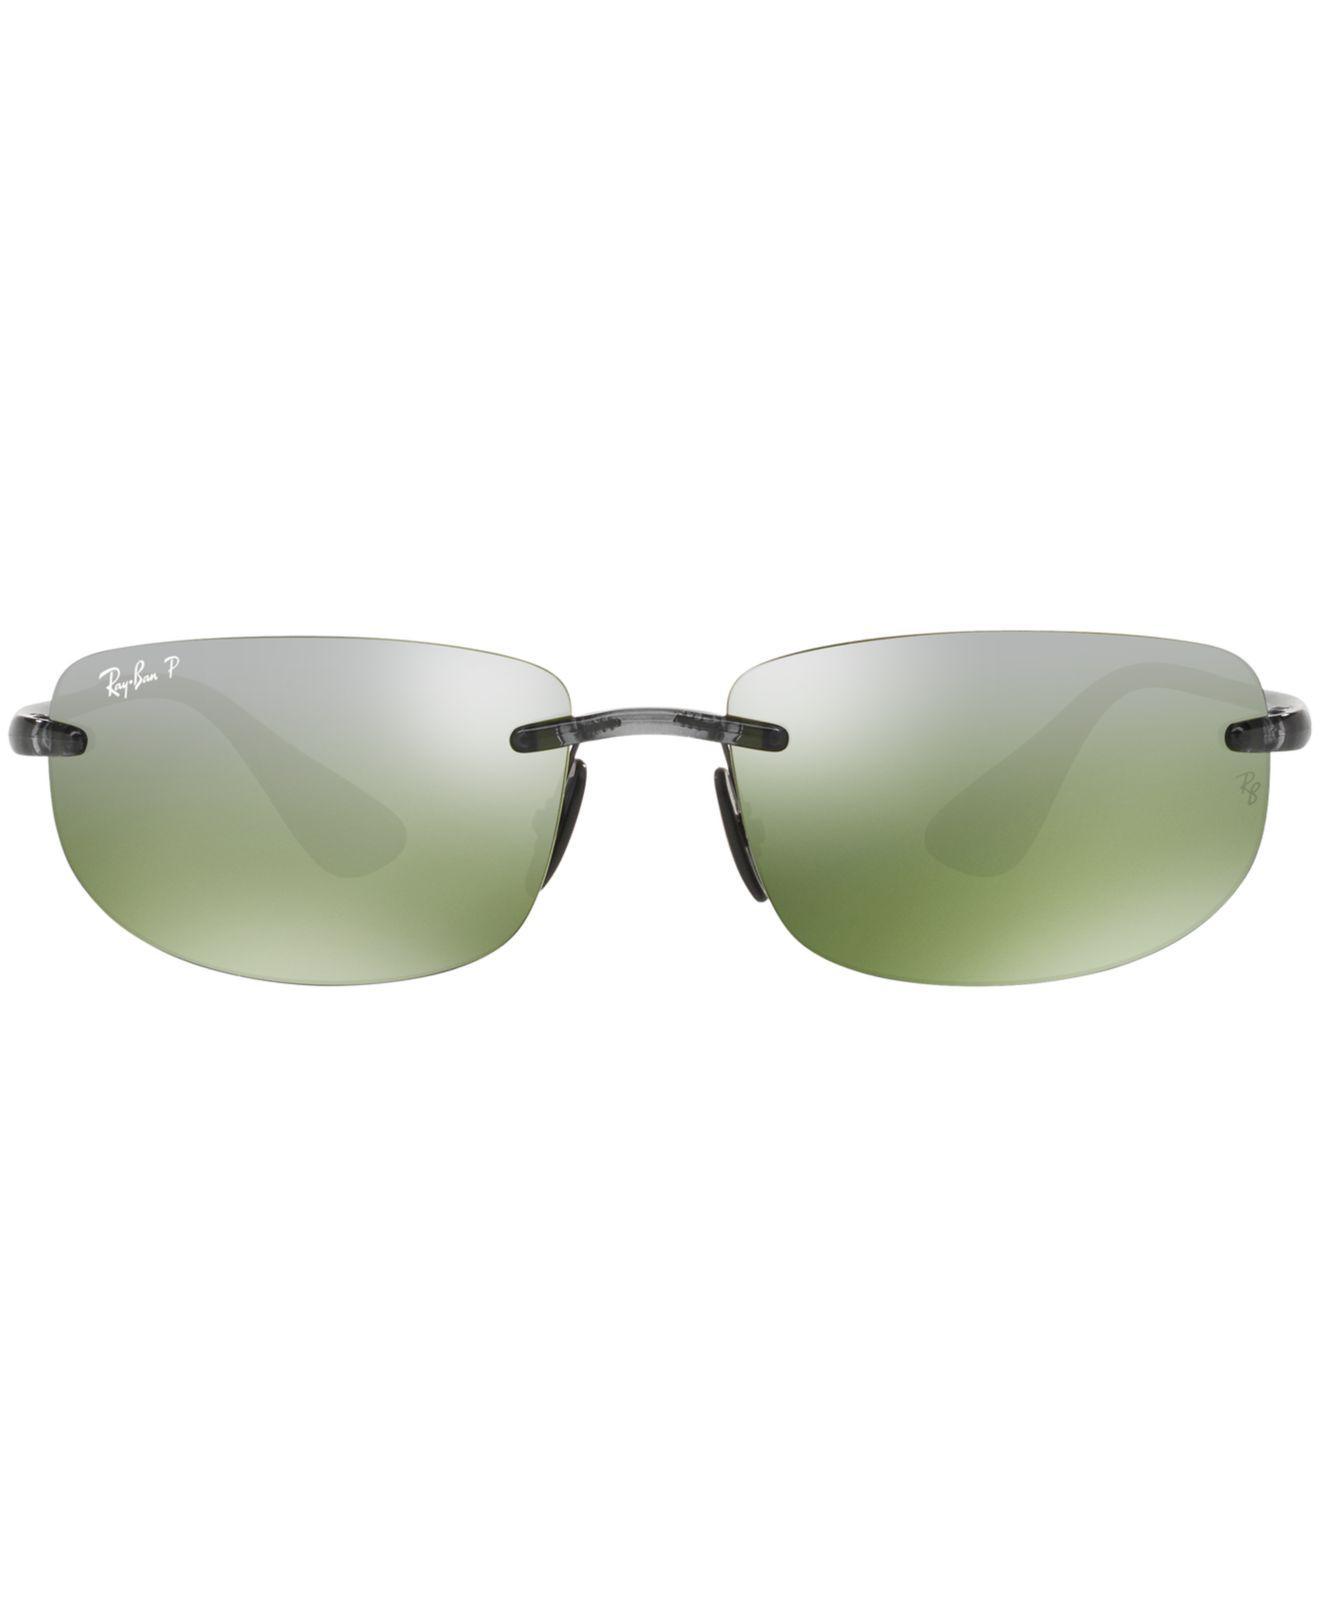 1f074131ac Women s Green Polarized Sunglasses